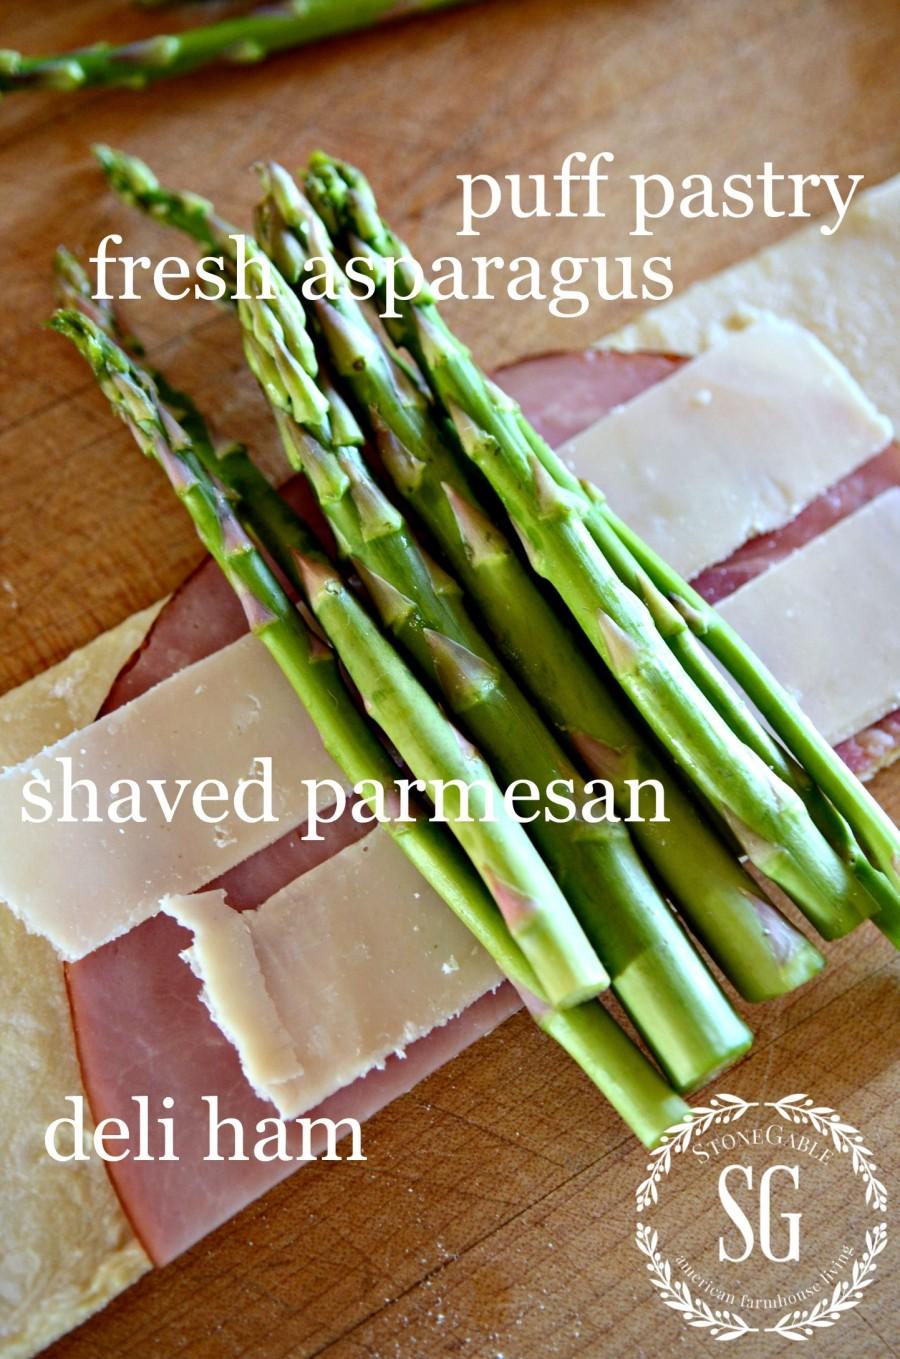 ASPARAGUS HAM AND PARMESAN PUFF PASTRY BUNDLES- ingredients-stonegableblog.com